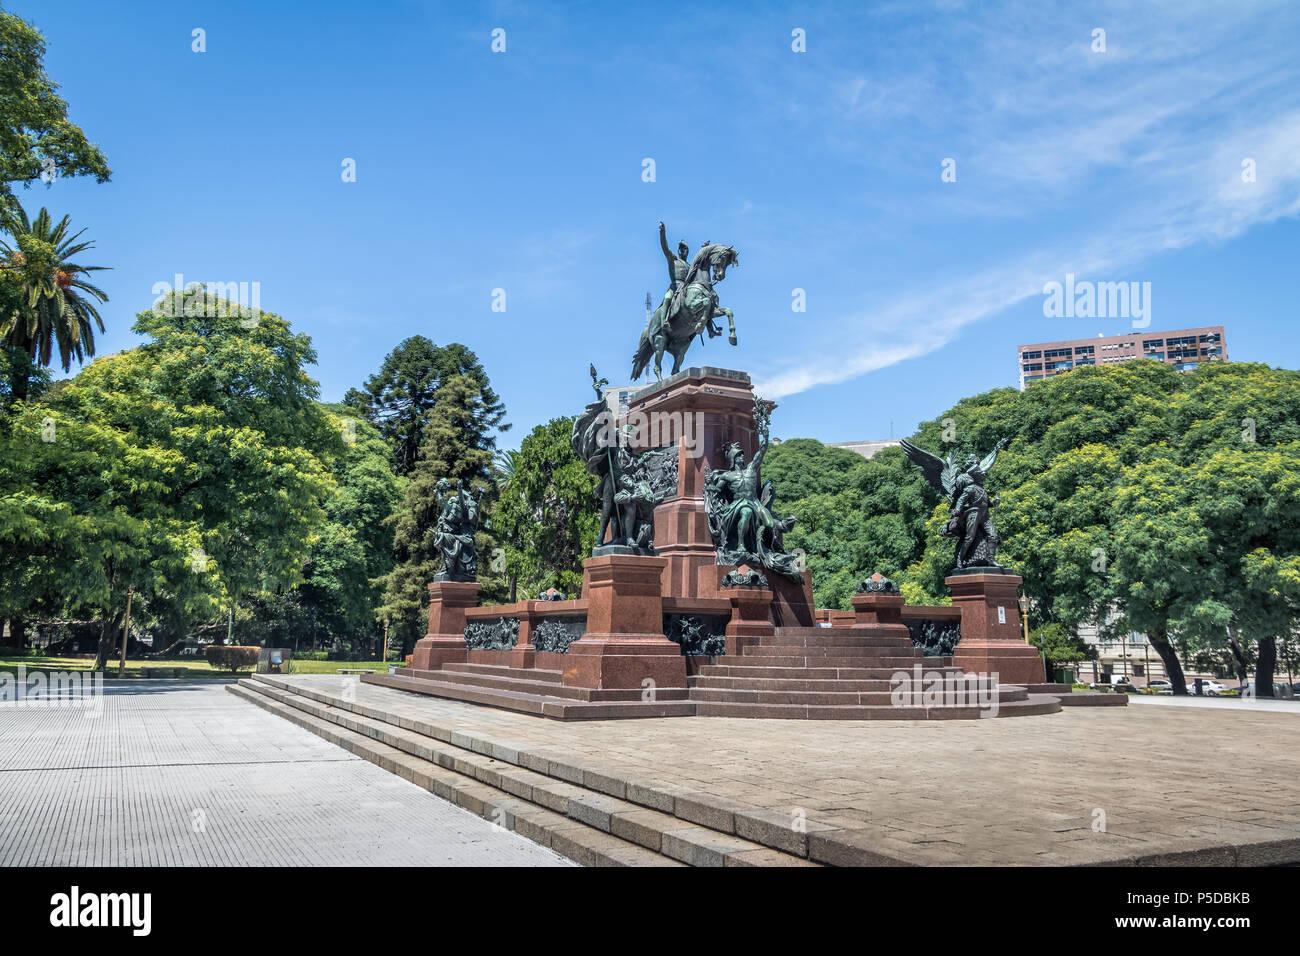 San Martin Statue at General San Martin Plaza in Retiro - Buenos Aires, Argentina - Stock Image